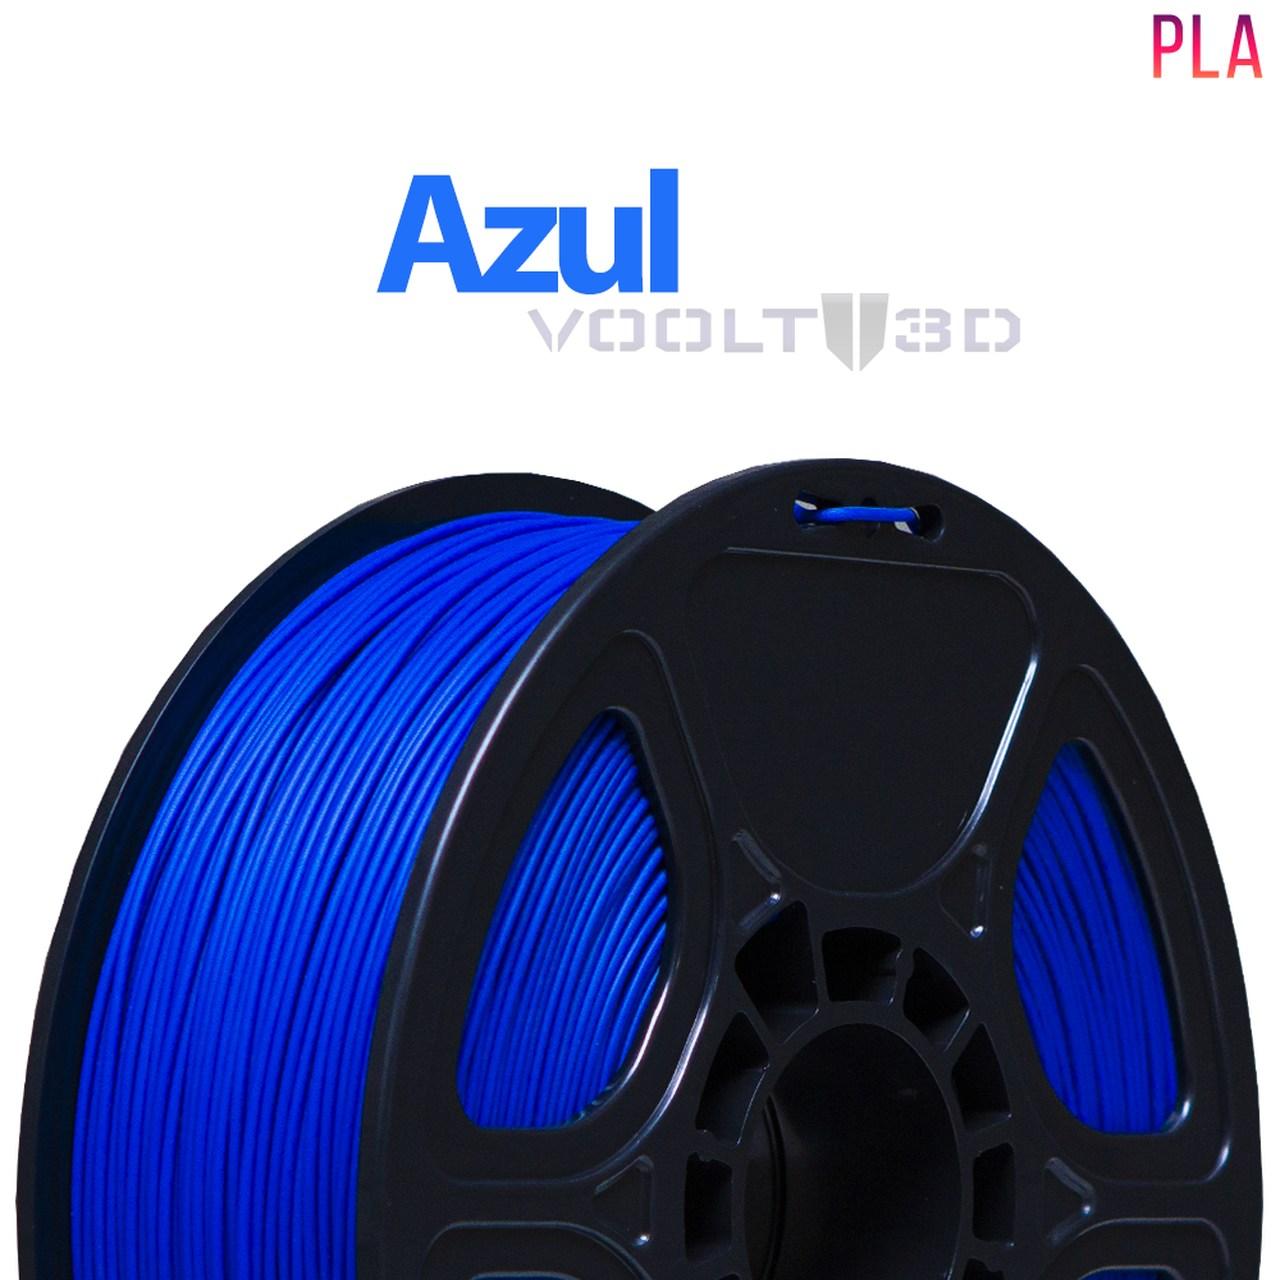 Filamento PLA - Azul - Voolt - 1.75mm - 1kg